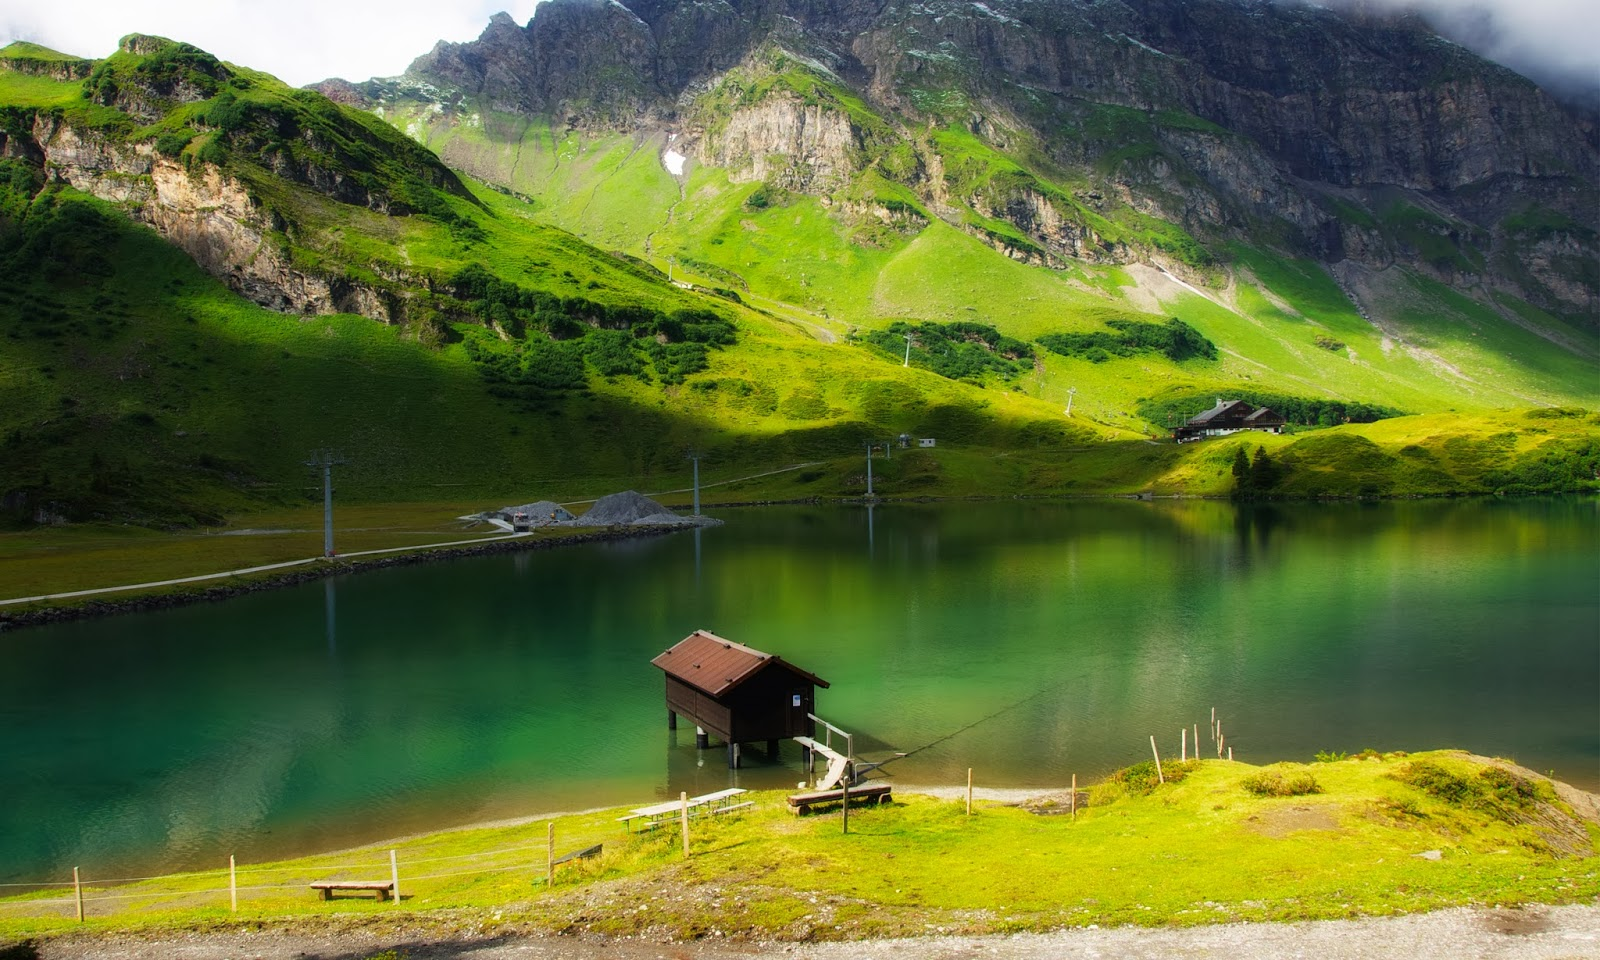 Switzerland hd wallpapers no1hdwallpapers - Wallpaper definition ...